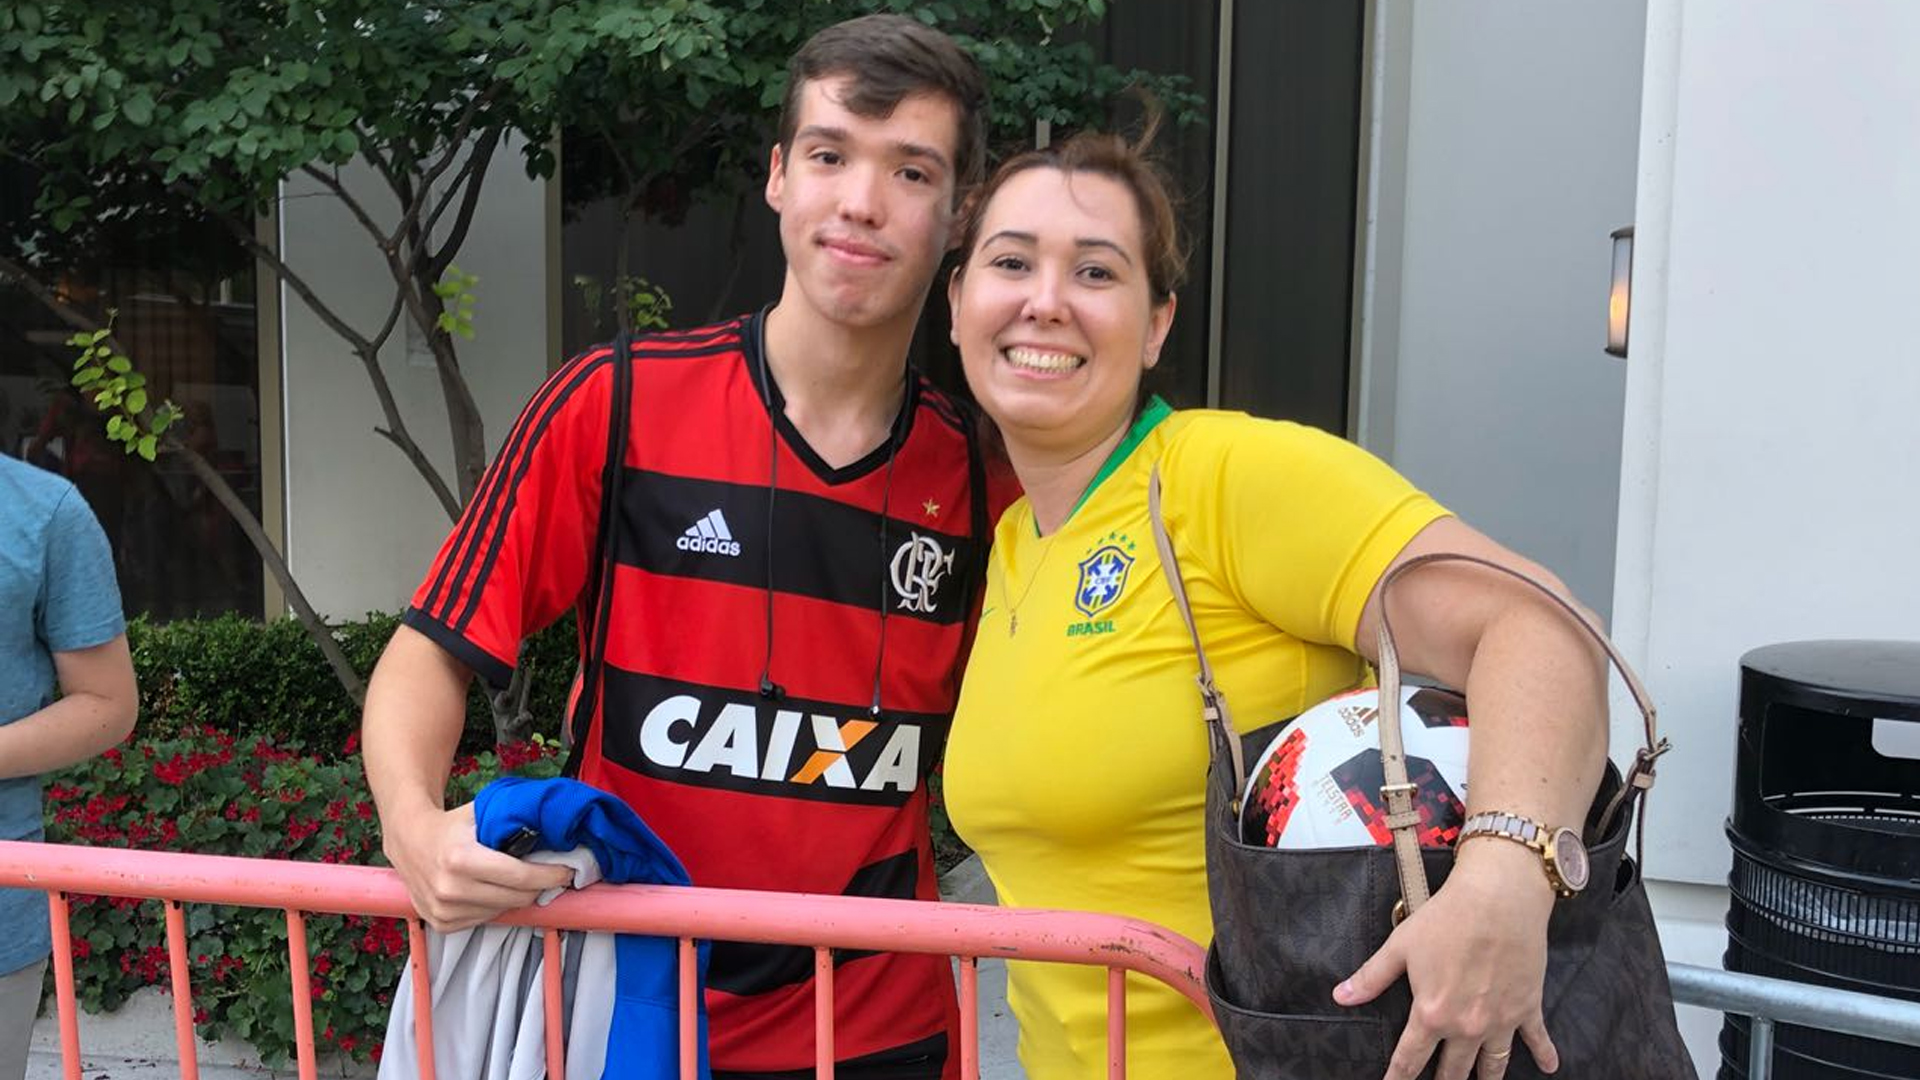 Torcedores Brasil amistoso EUA New Jersey 04 09 18